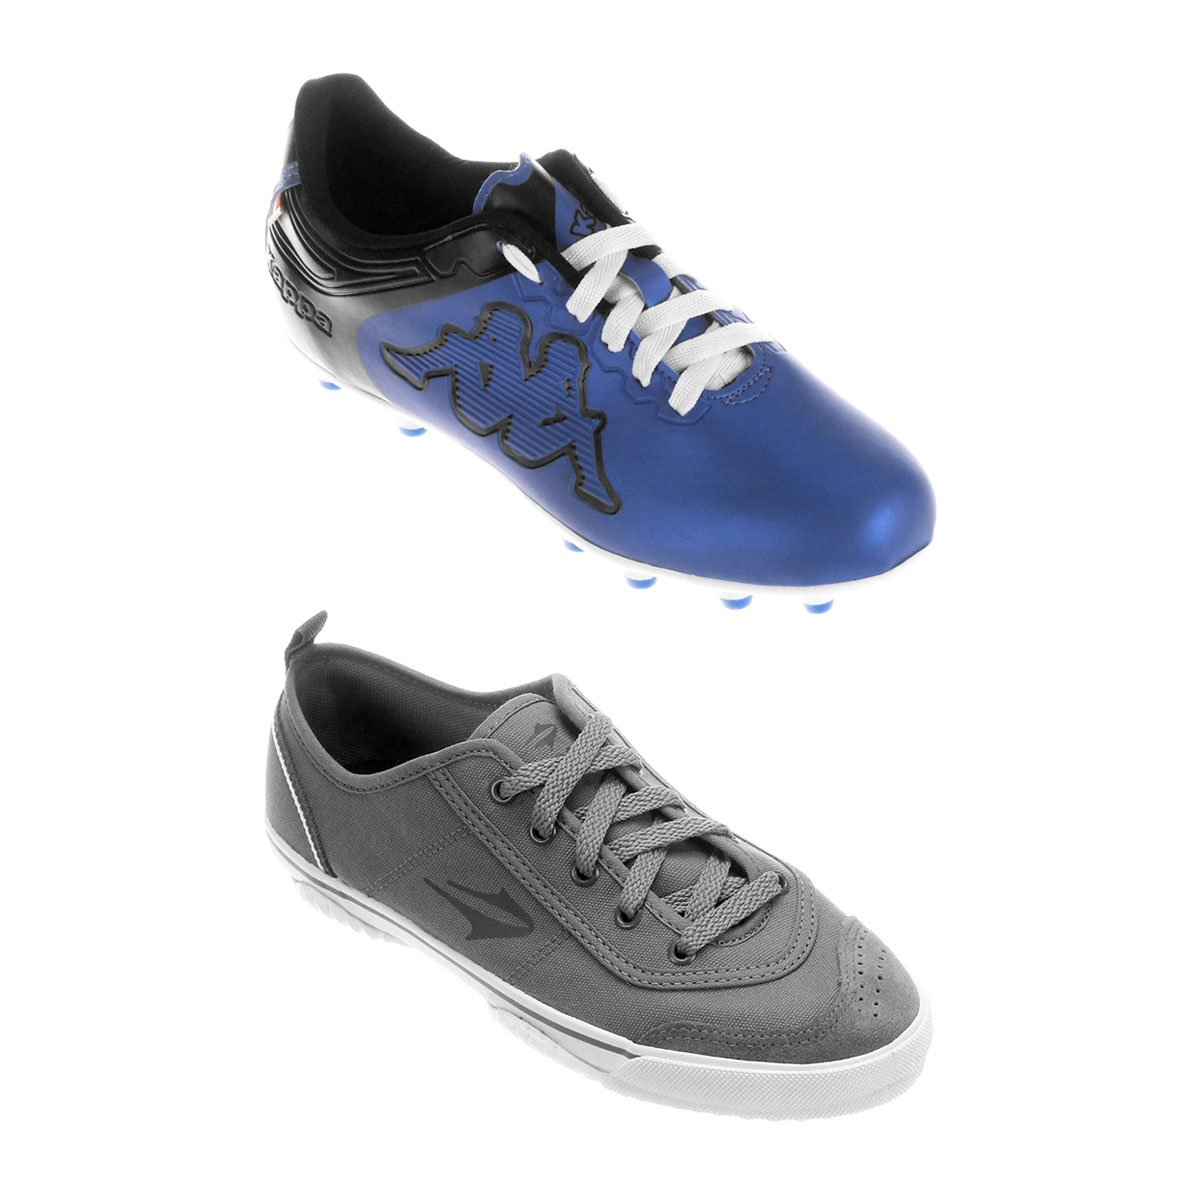 075fd033572 Kit Chuteira Kappa Fuerza Campo + Chuteira Topper New Casual 3 Futsal -  Compre Agora